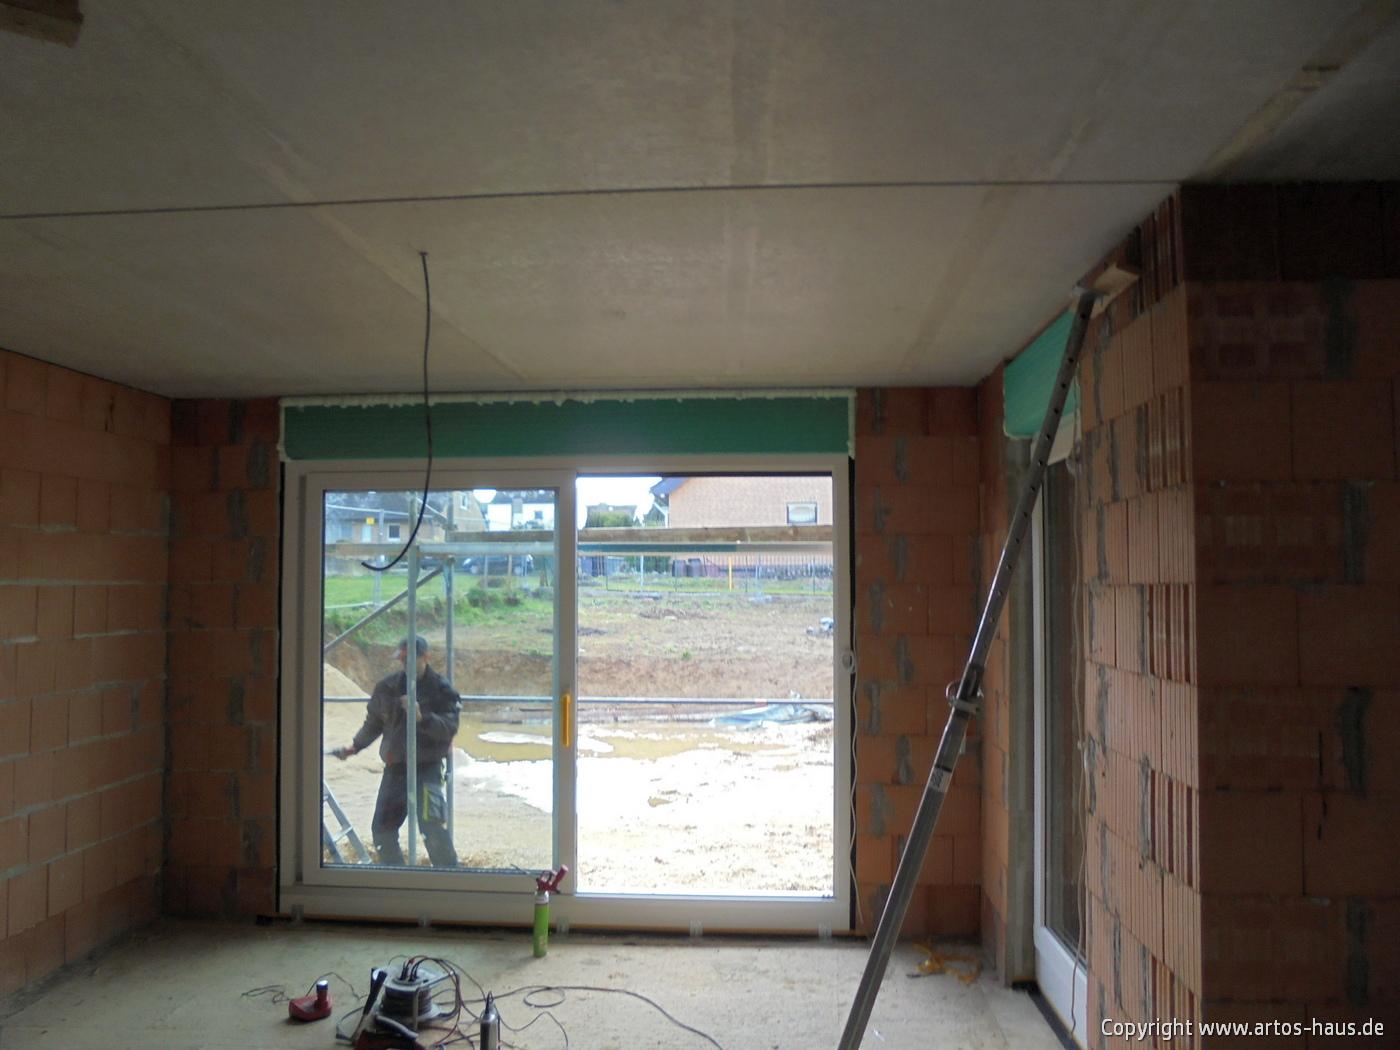 Fenstereinbau | ARTOS-HAUS Bild 3